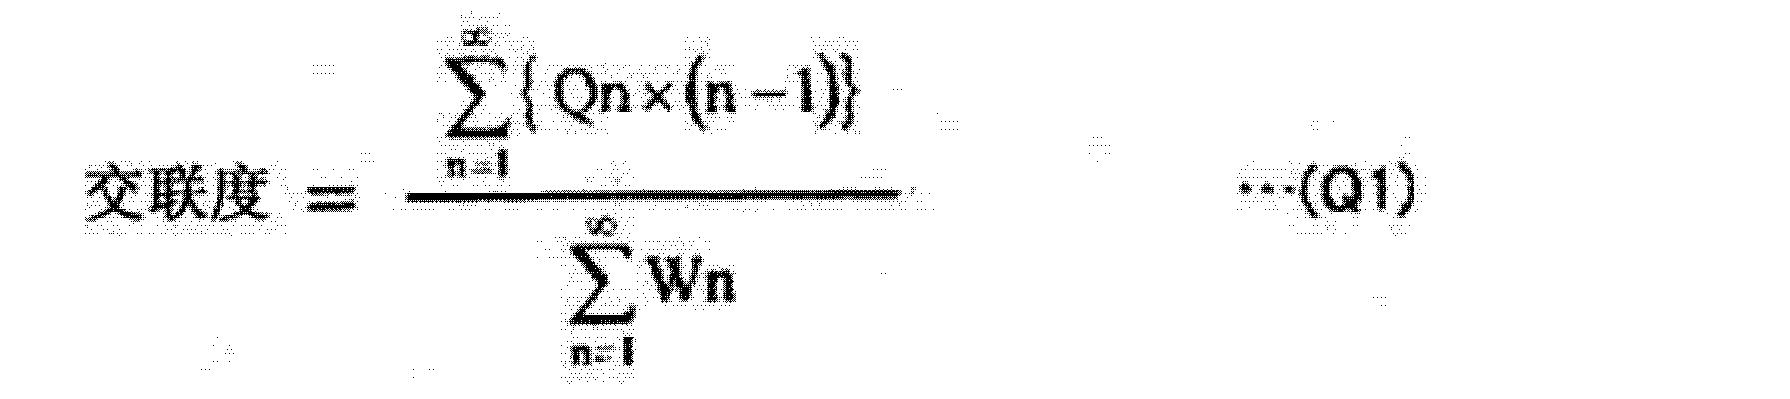 Figure CN103747812AD00161